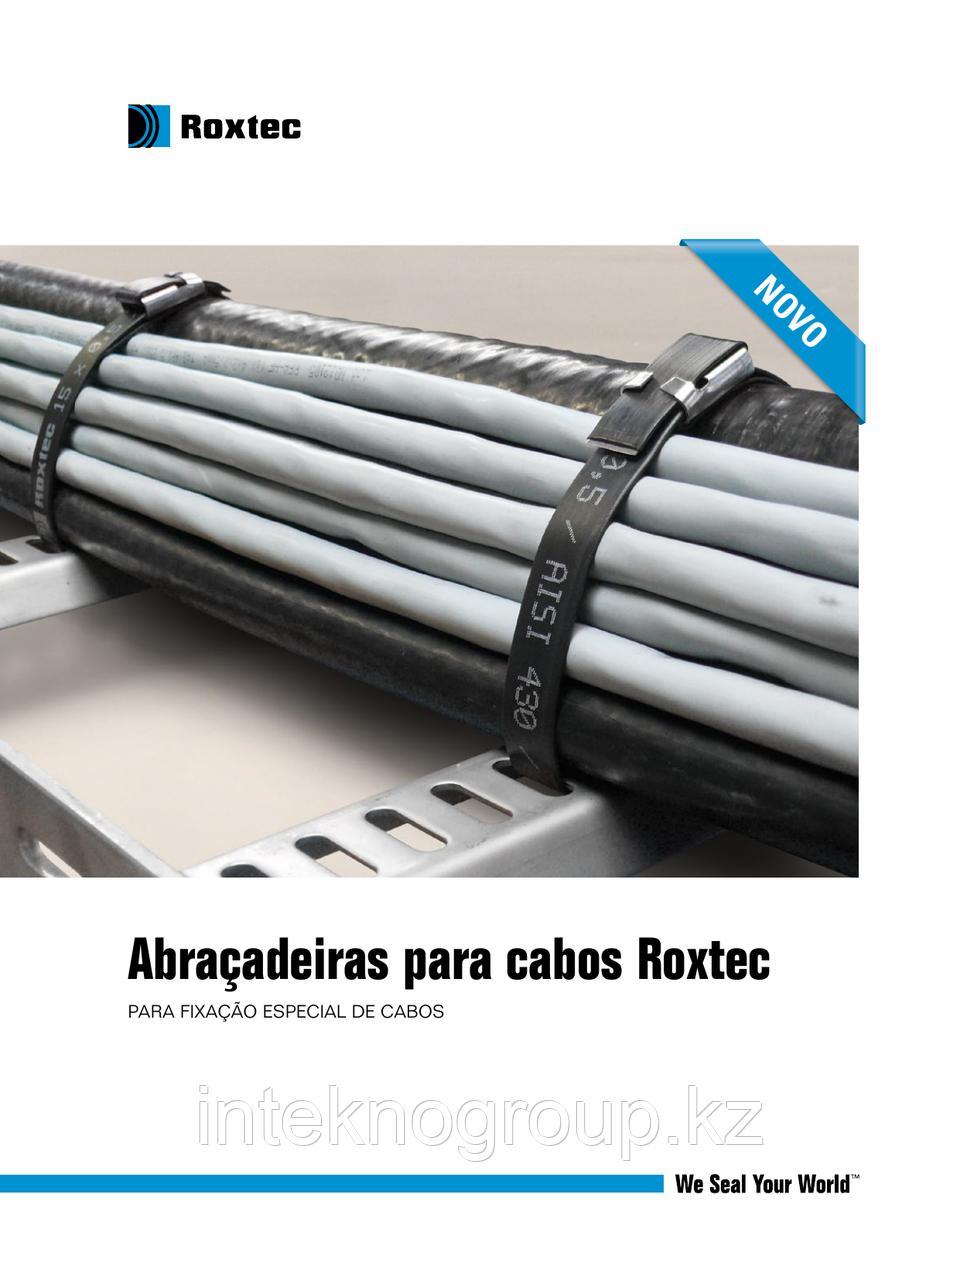 Roxtec Cable straps Strap 15x0,5 black/ss. L=400 mm